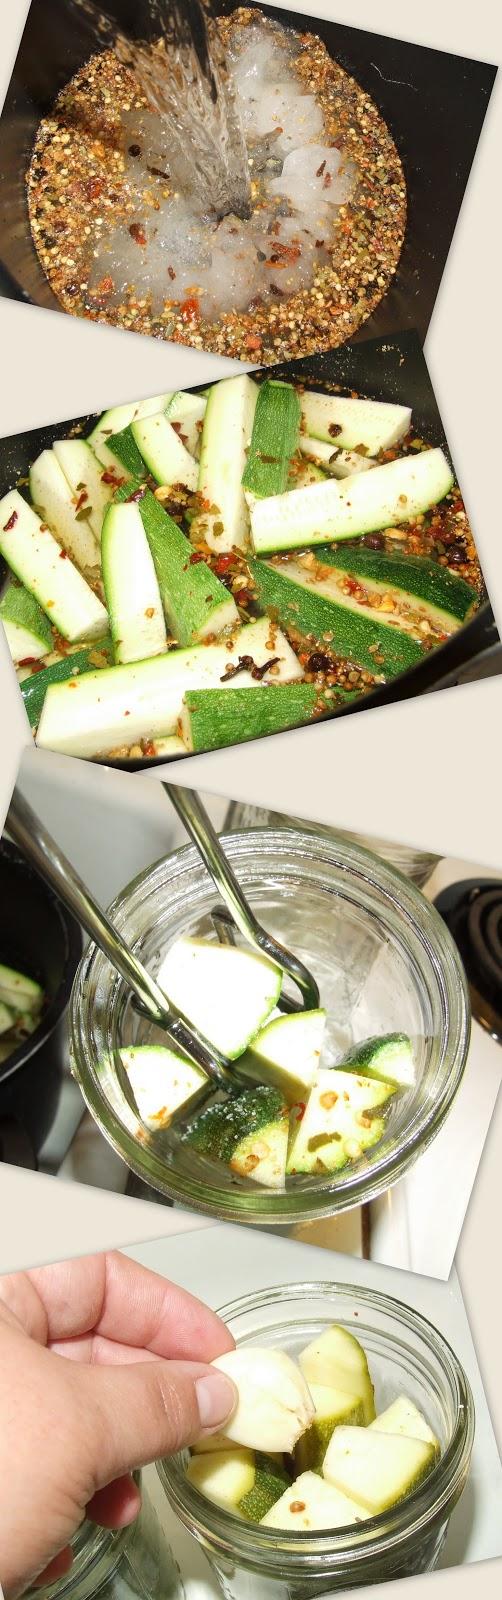 Stuff by Cher: Zucchini Pickles